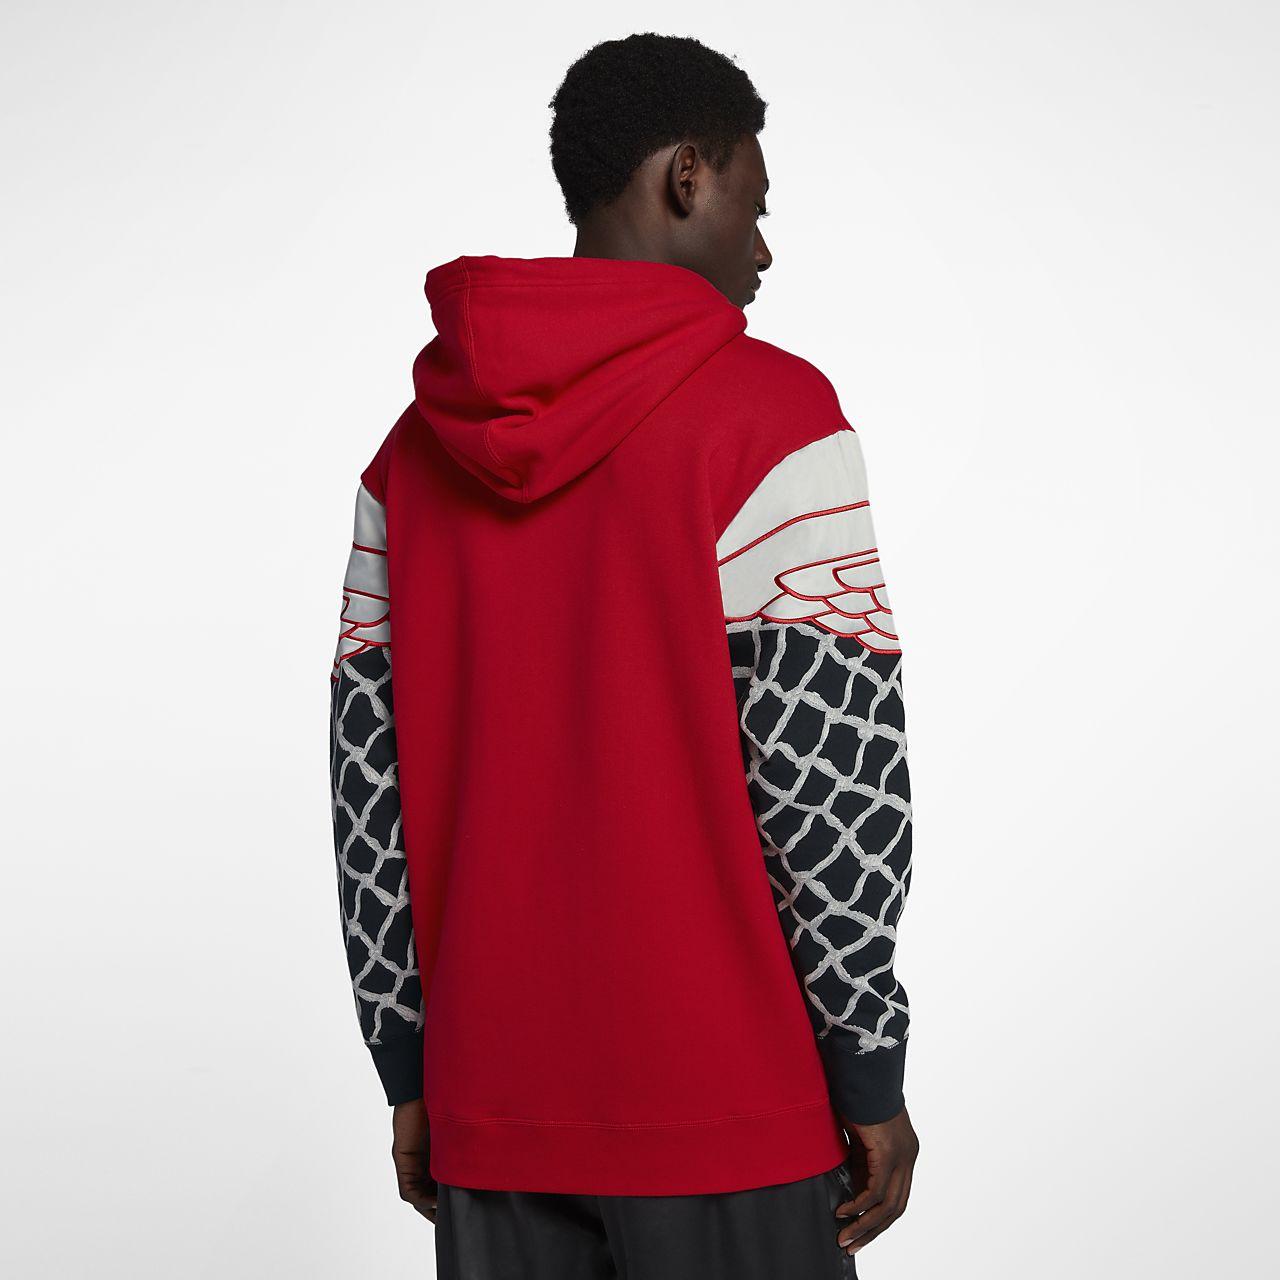 d8d60198db1c Jordan Sportswear Pinnacle Men s Pullover Hoodie. Nike.com CA